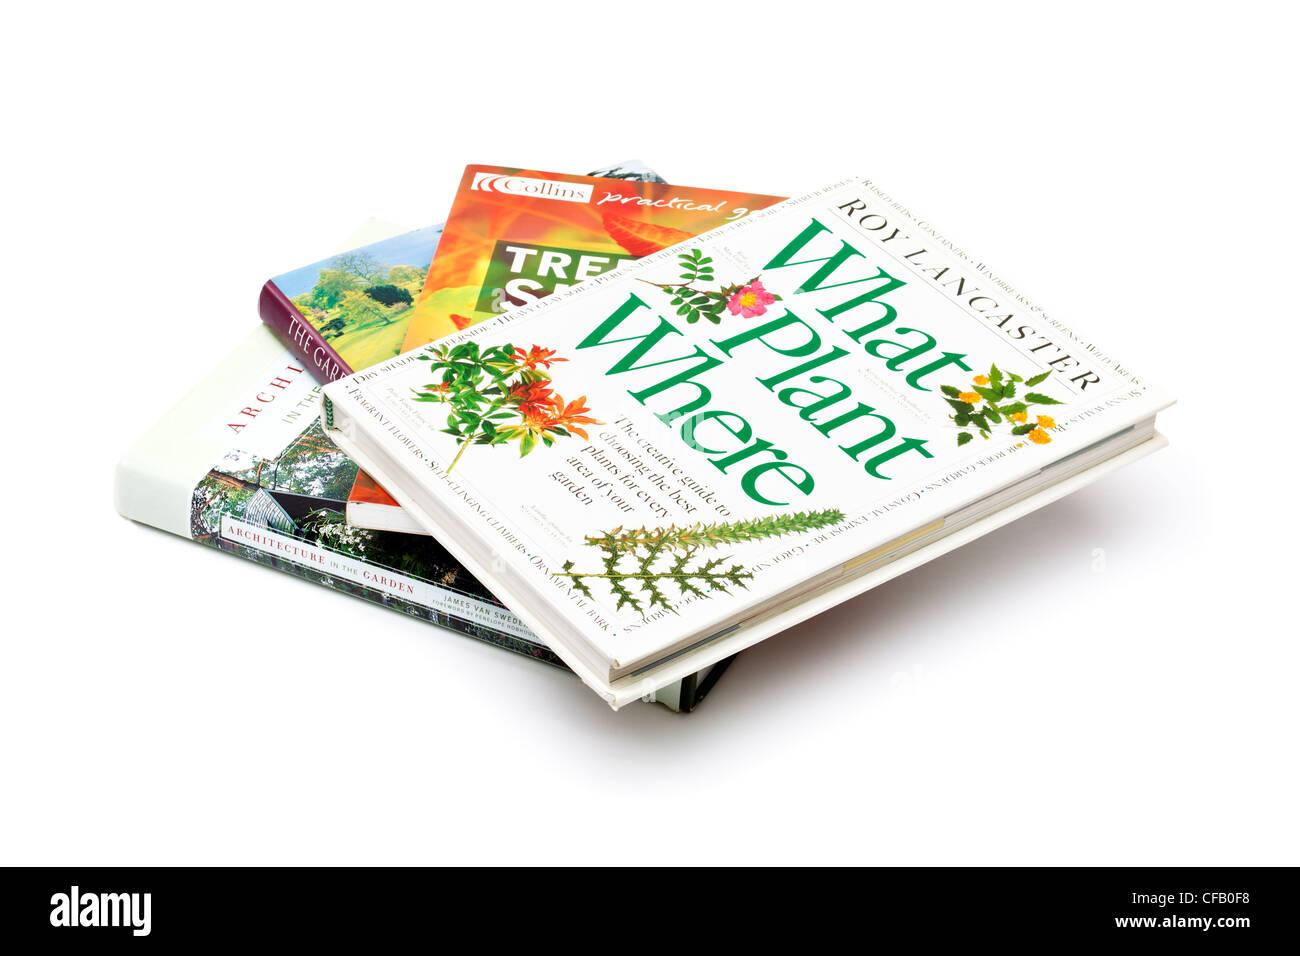 Gardening books - Stock Image